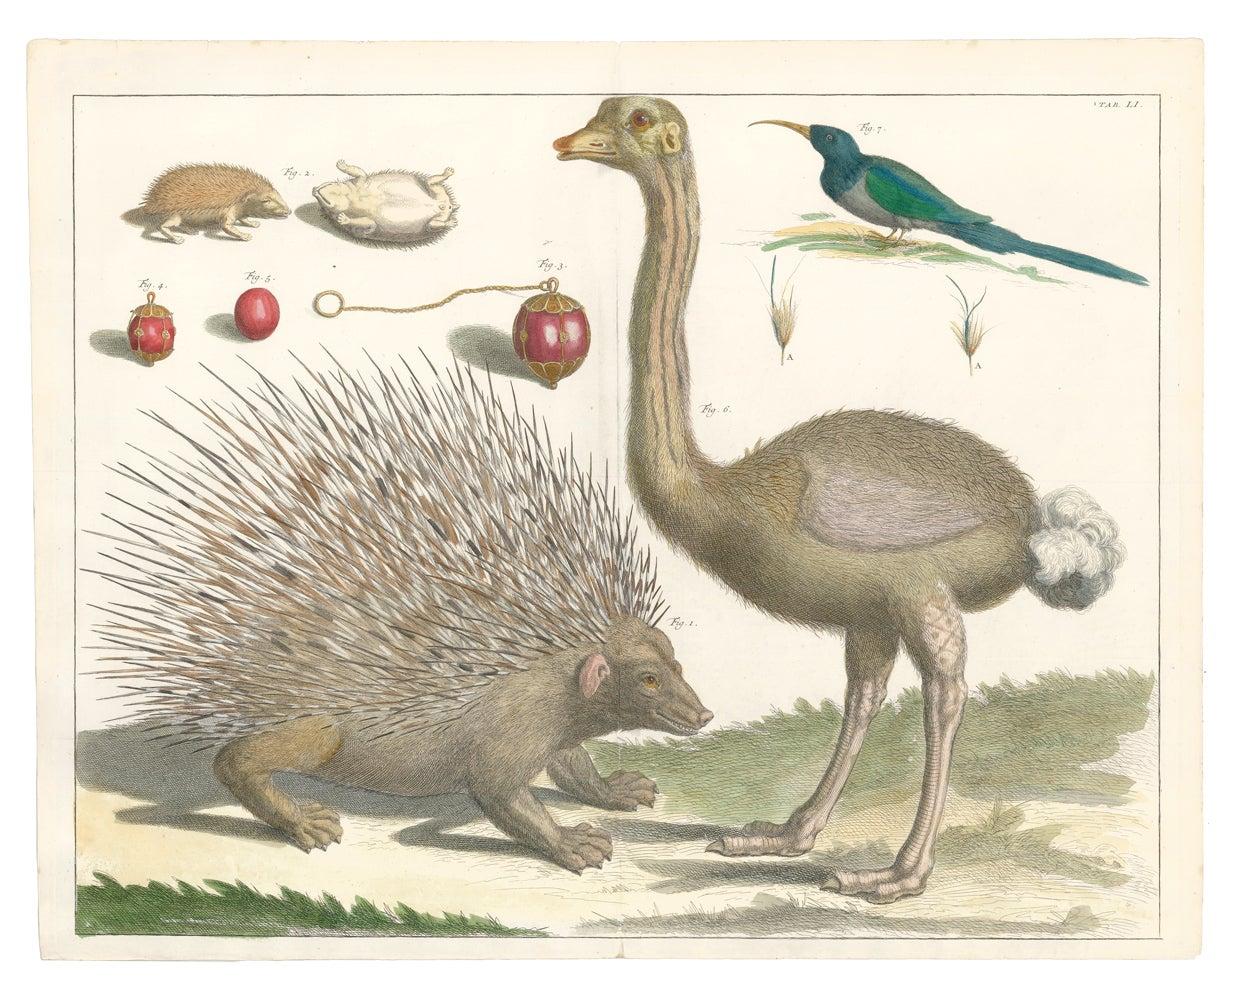 Ostrich, Porcupine and Hedgehog Engraving